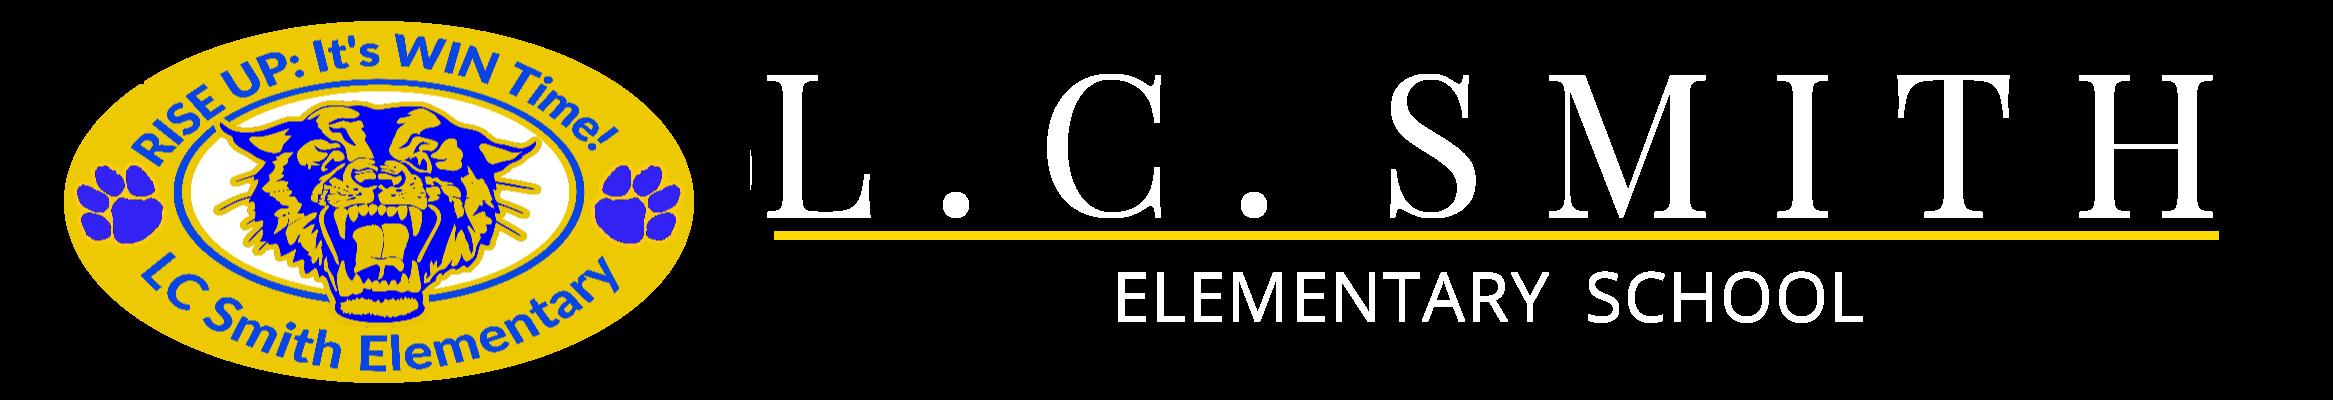 L.C. Smith Elementary School Logo